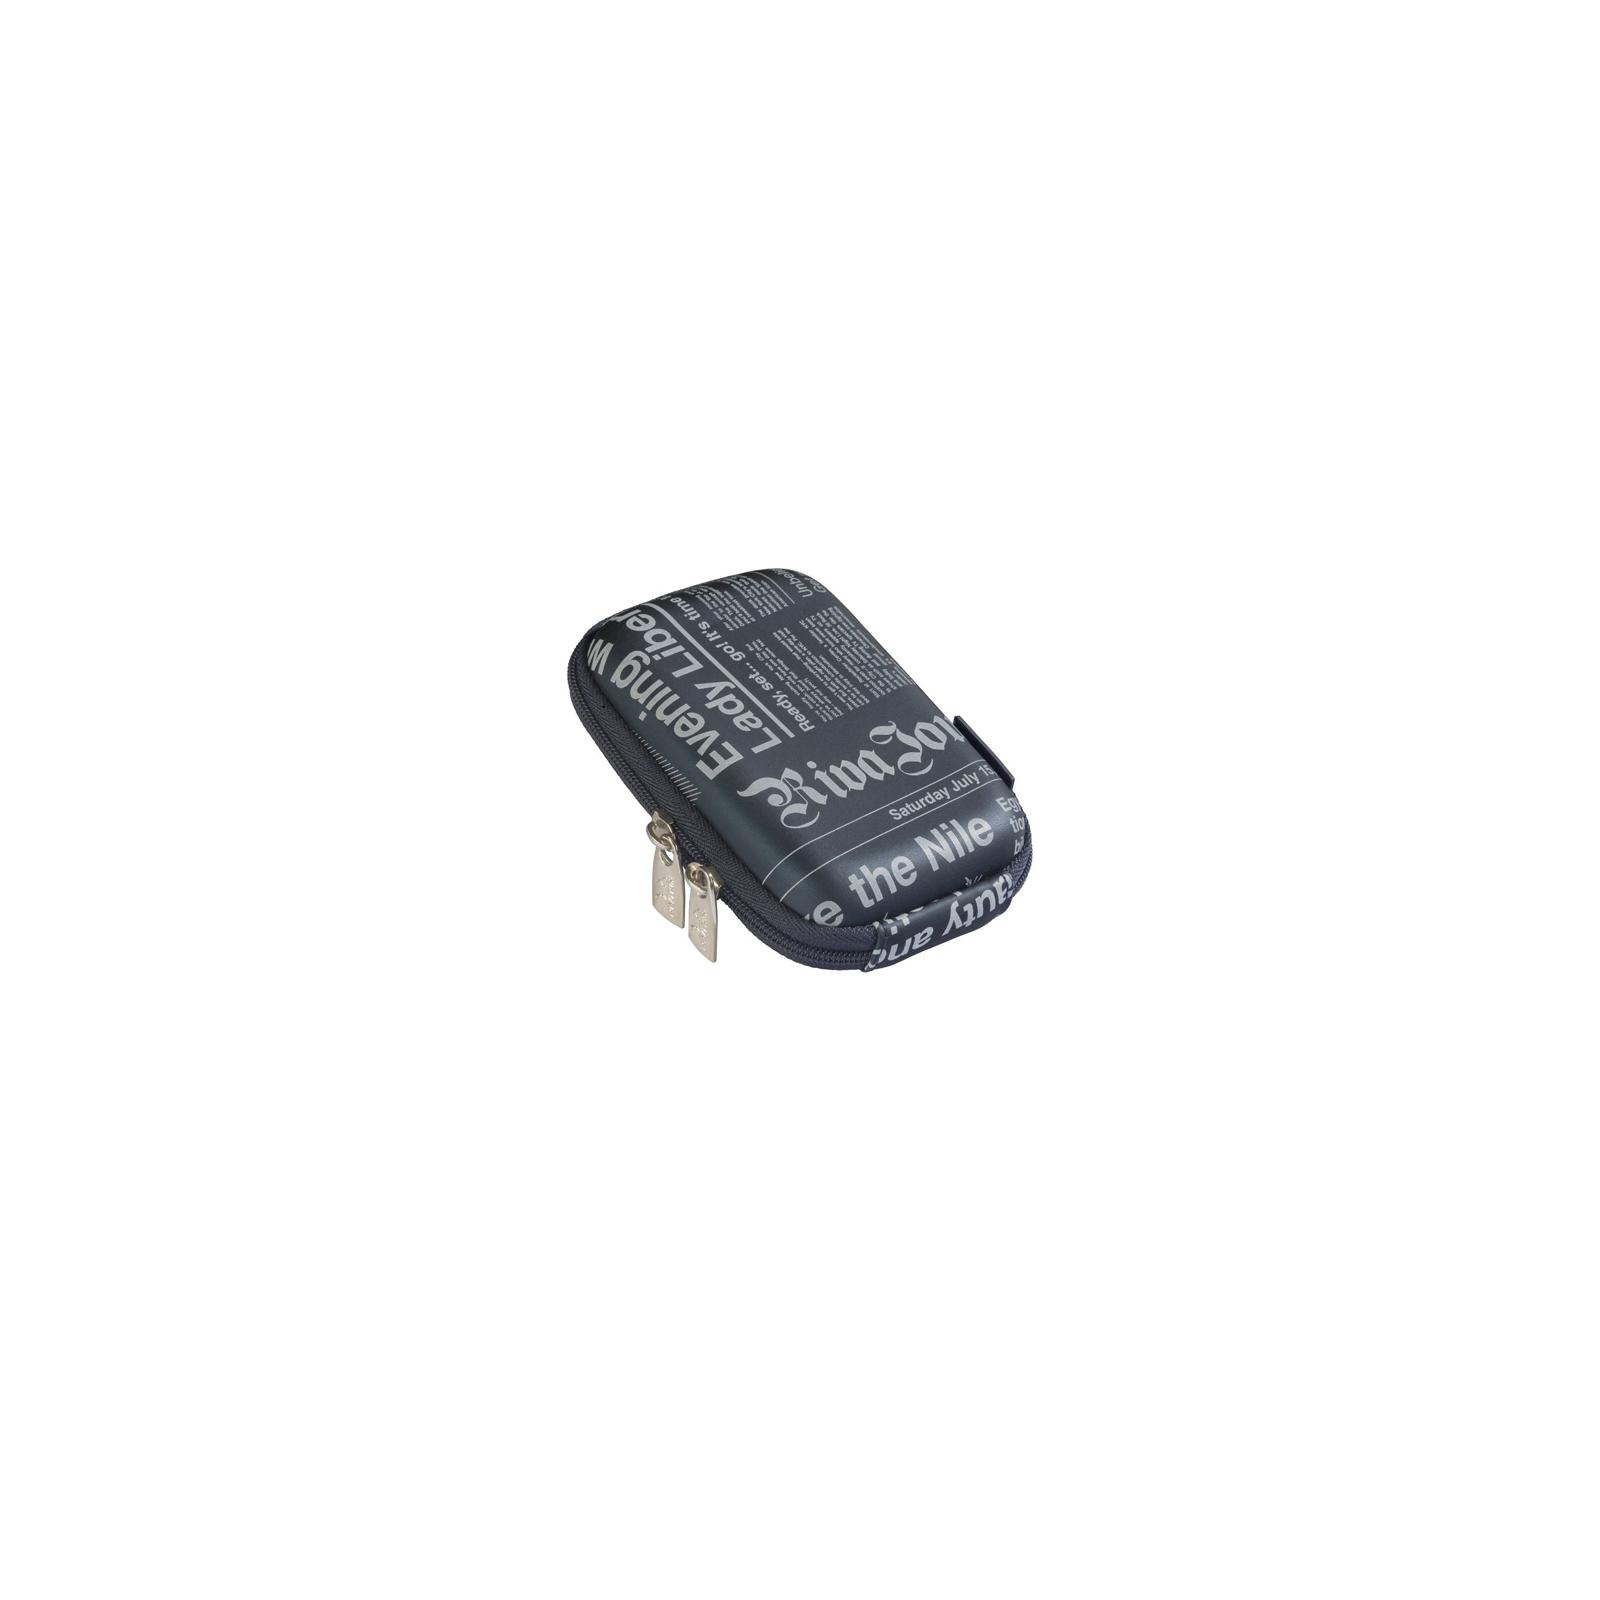 Фото-сумка RivaCase Digital Case (7103PU dark blue (newspaper)) изображение 2